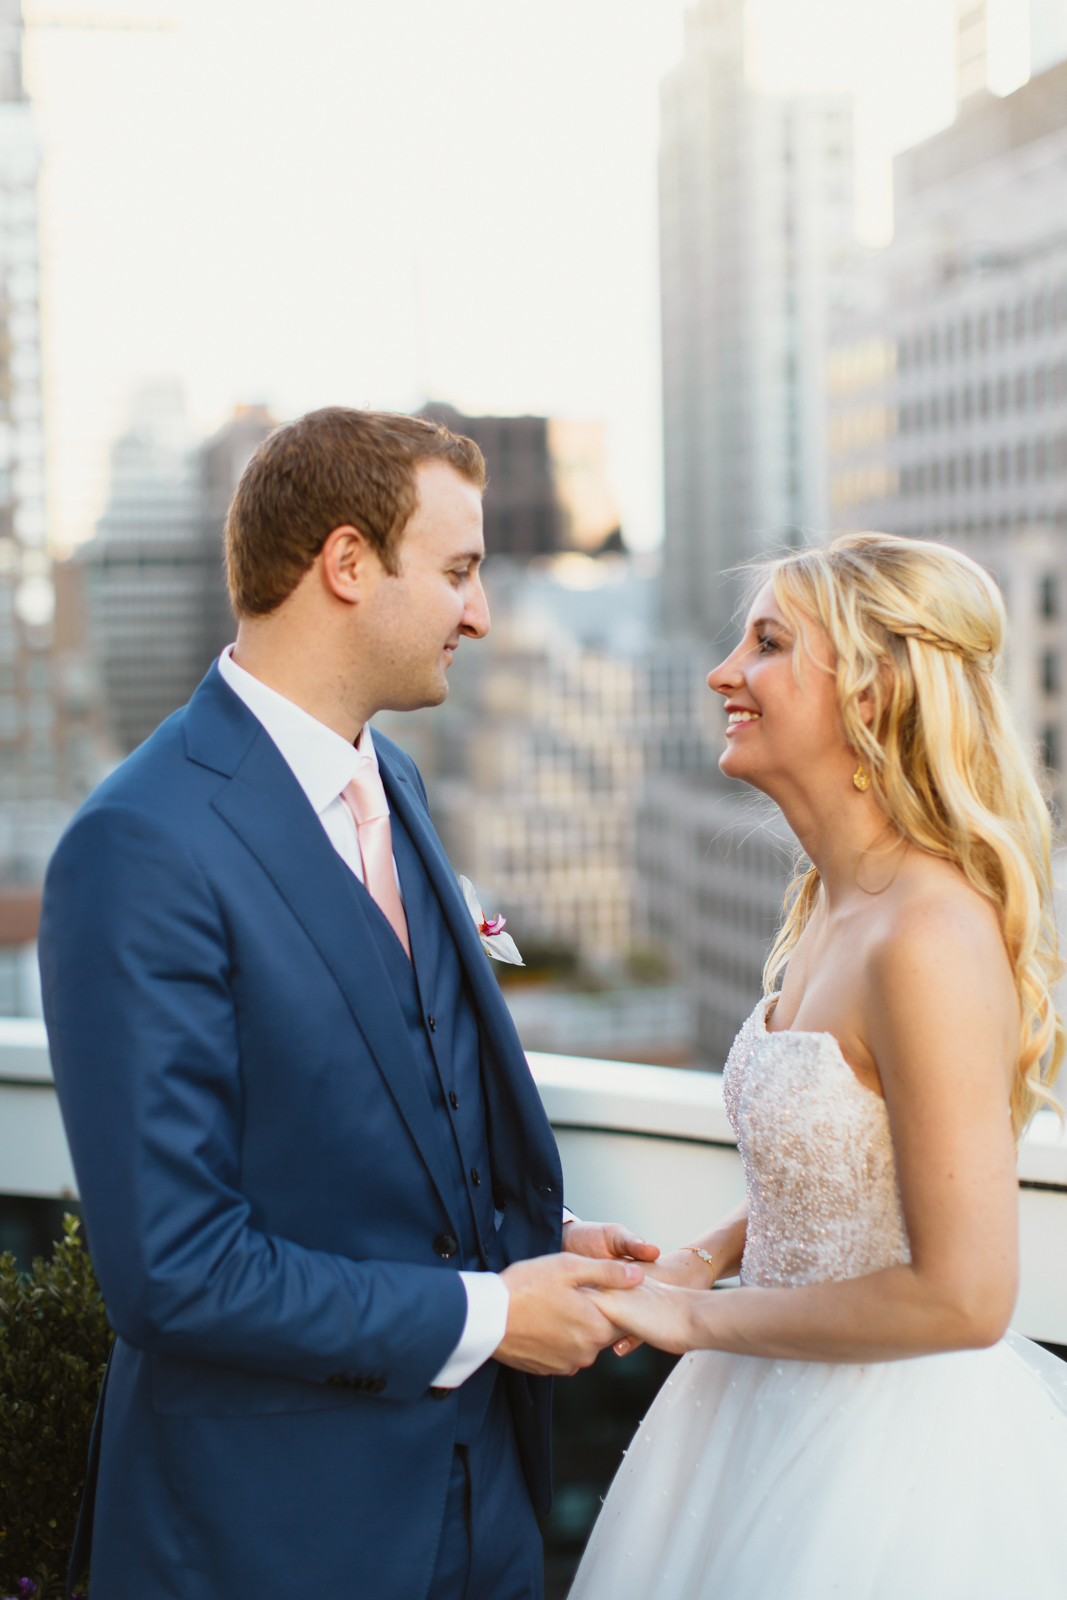 NYC Wedding Photography Sofitel Central Park Brooklyn Photographer Boris Zaretsky _B2C2751.jpg